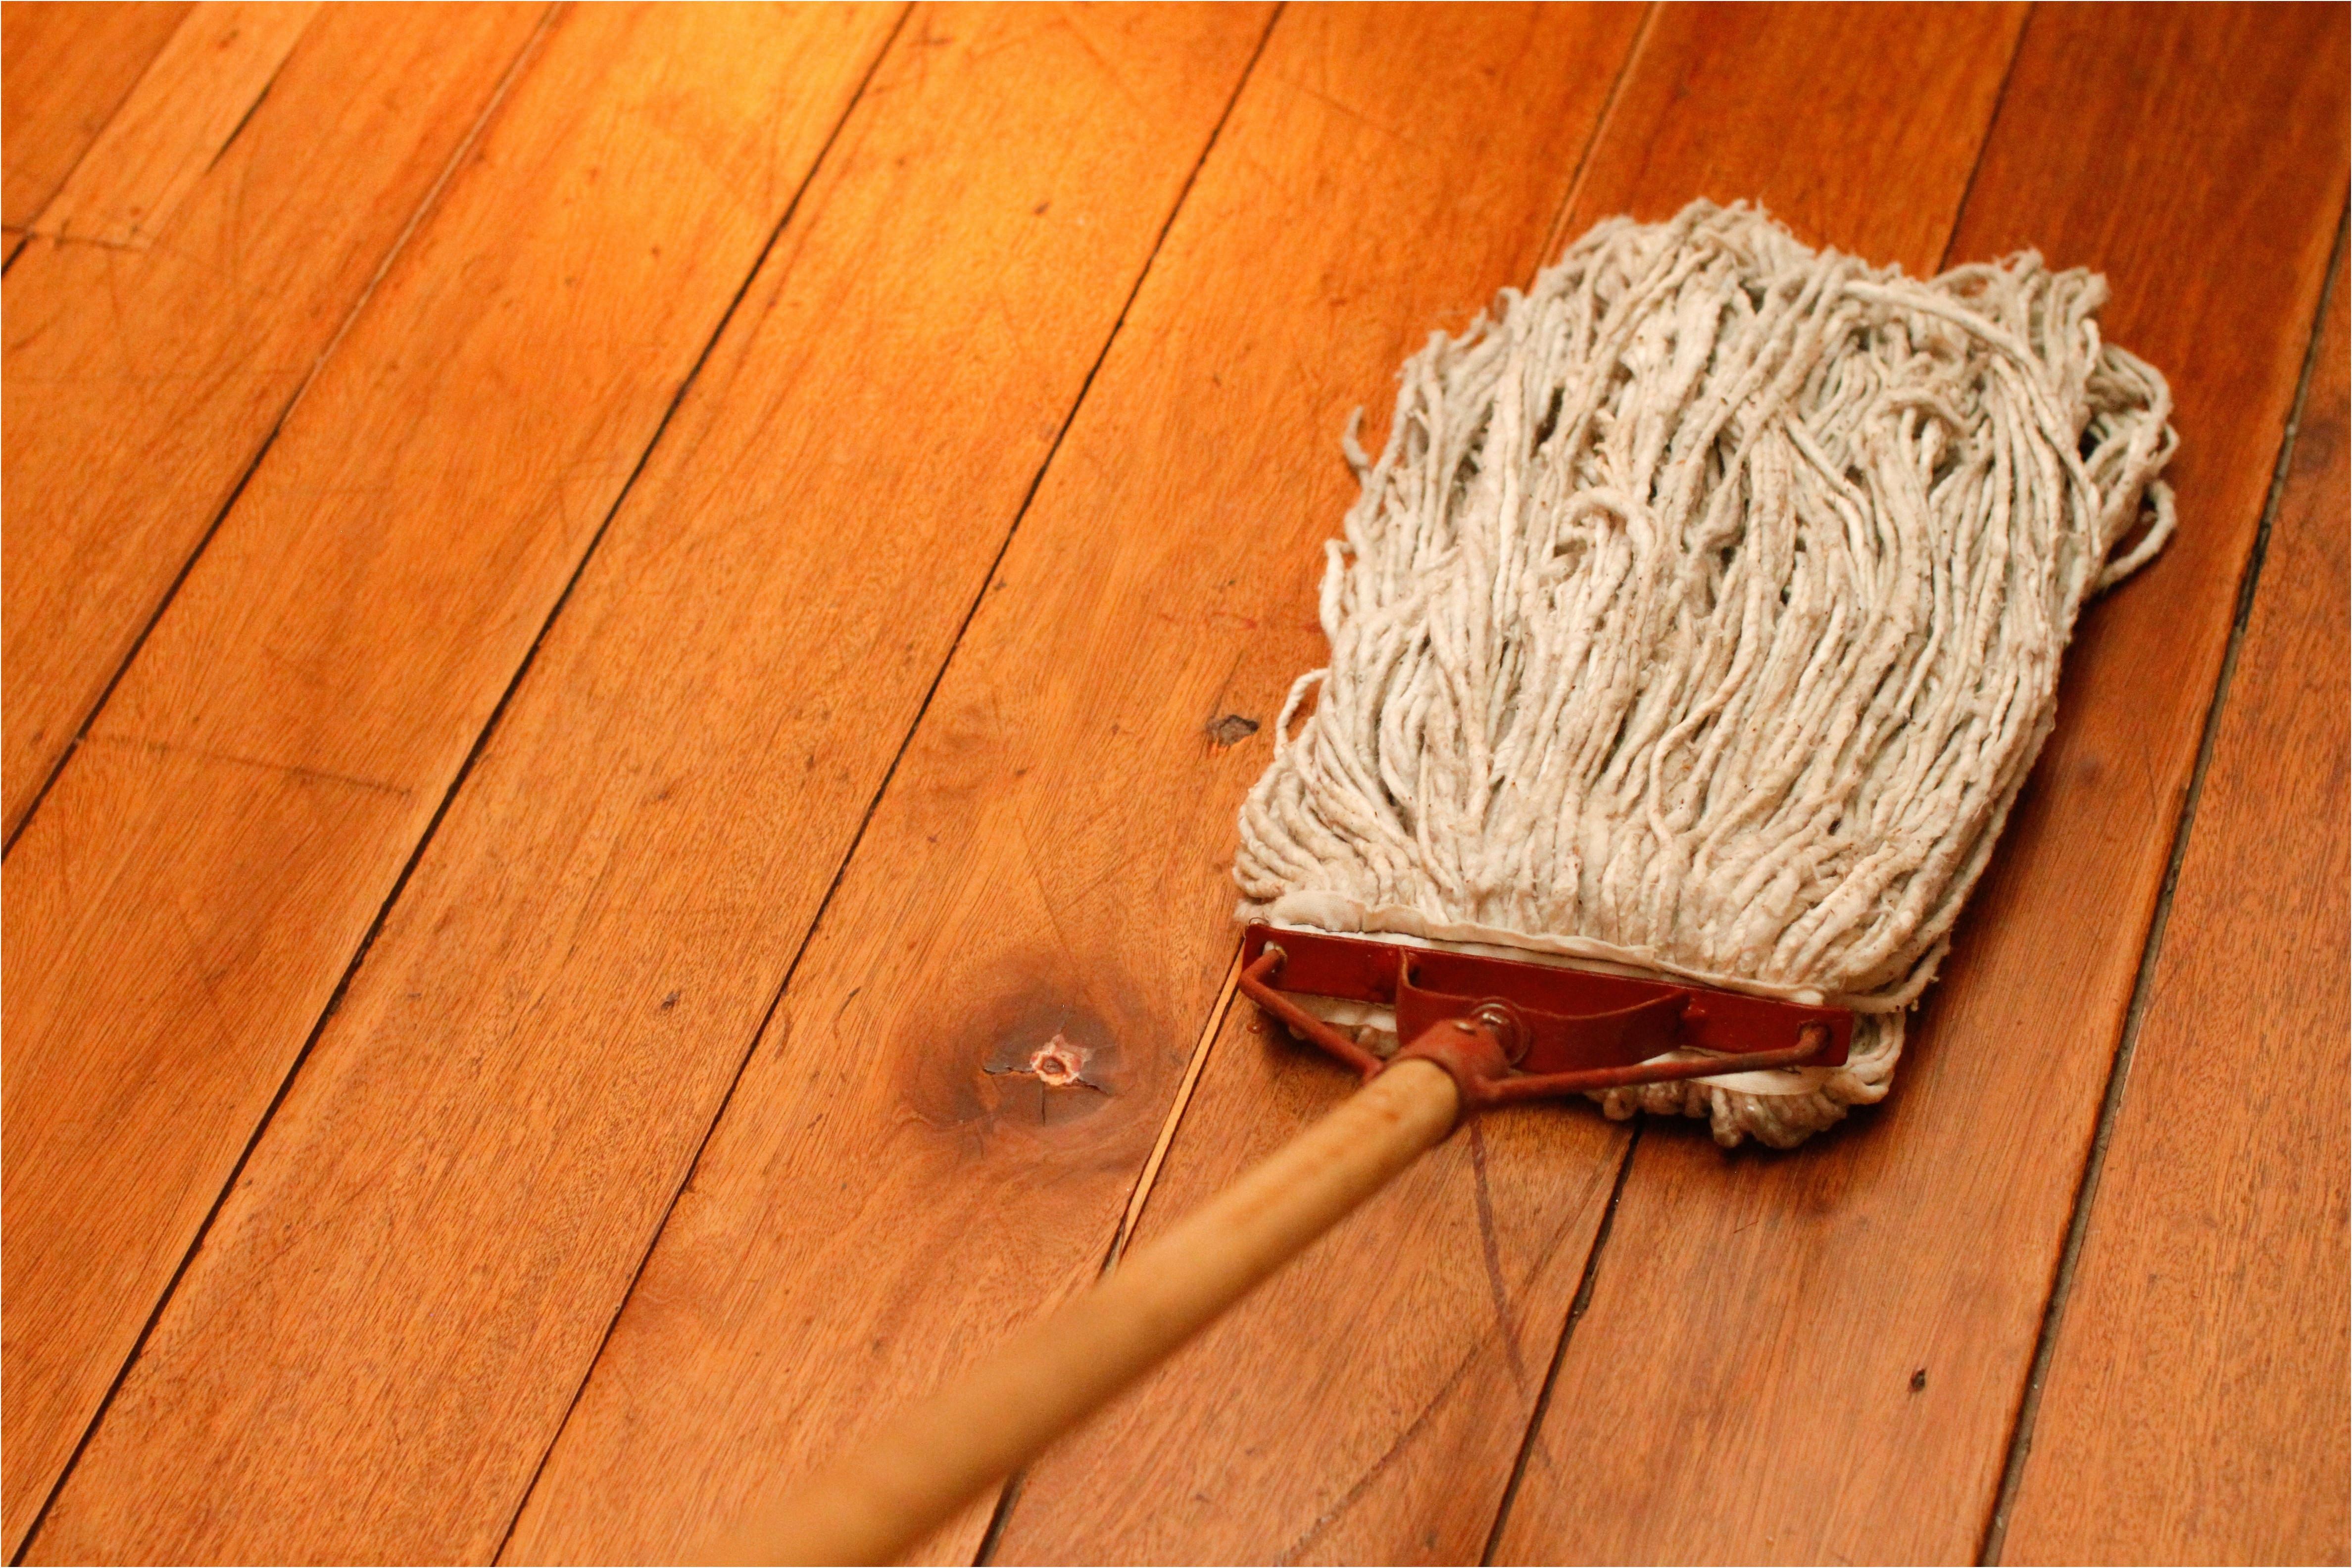 hardwood floors 2018 of laminate hardwood flooring cleaning elegant best place for laminate inside laminate hardwood flooring cleaning elegant best place for laminate flooring stock 0d grace place barnegat nj